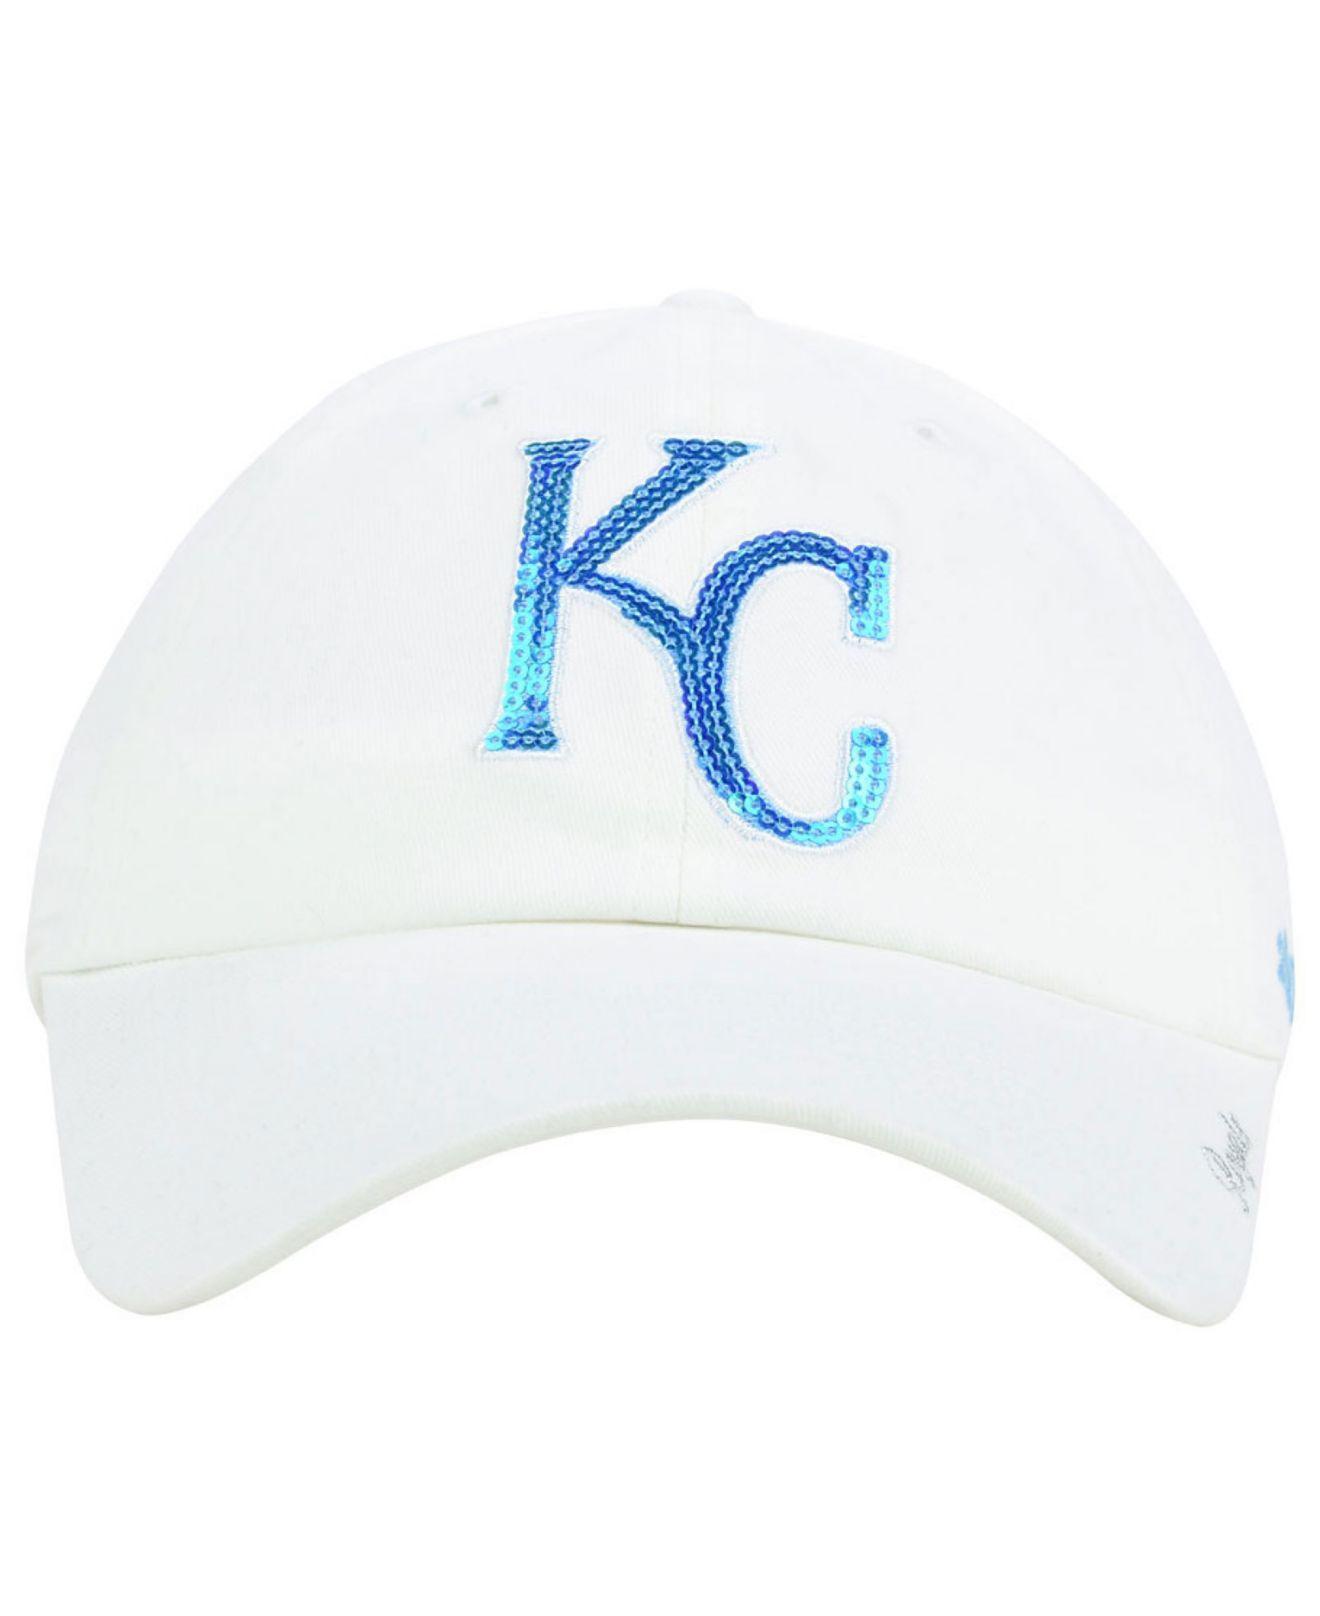 online retailer 1b028 81491 uk kansas city royals fedora hat womens a1fec 00166